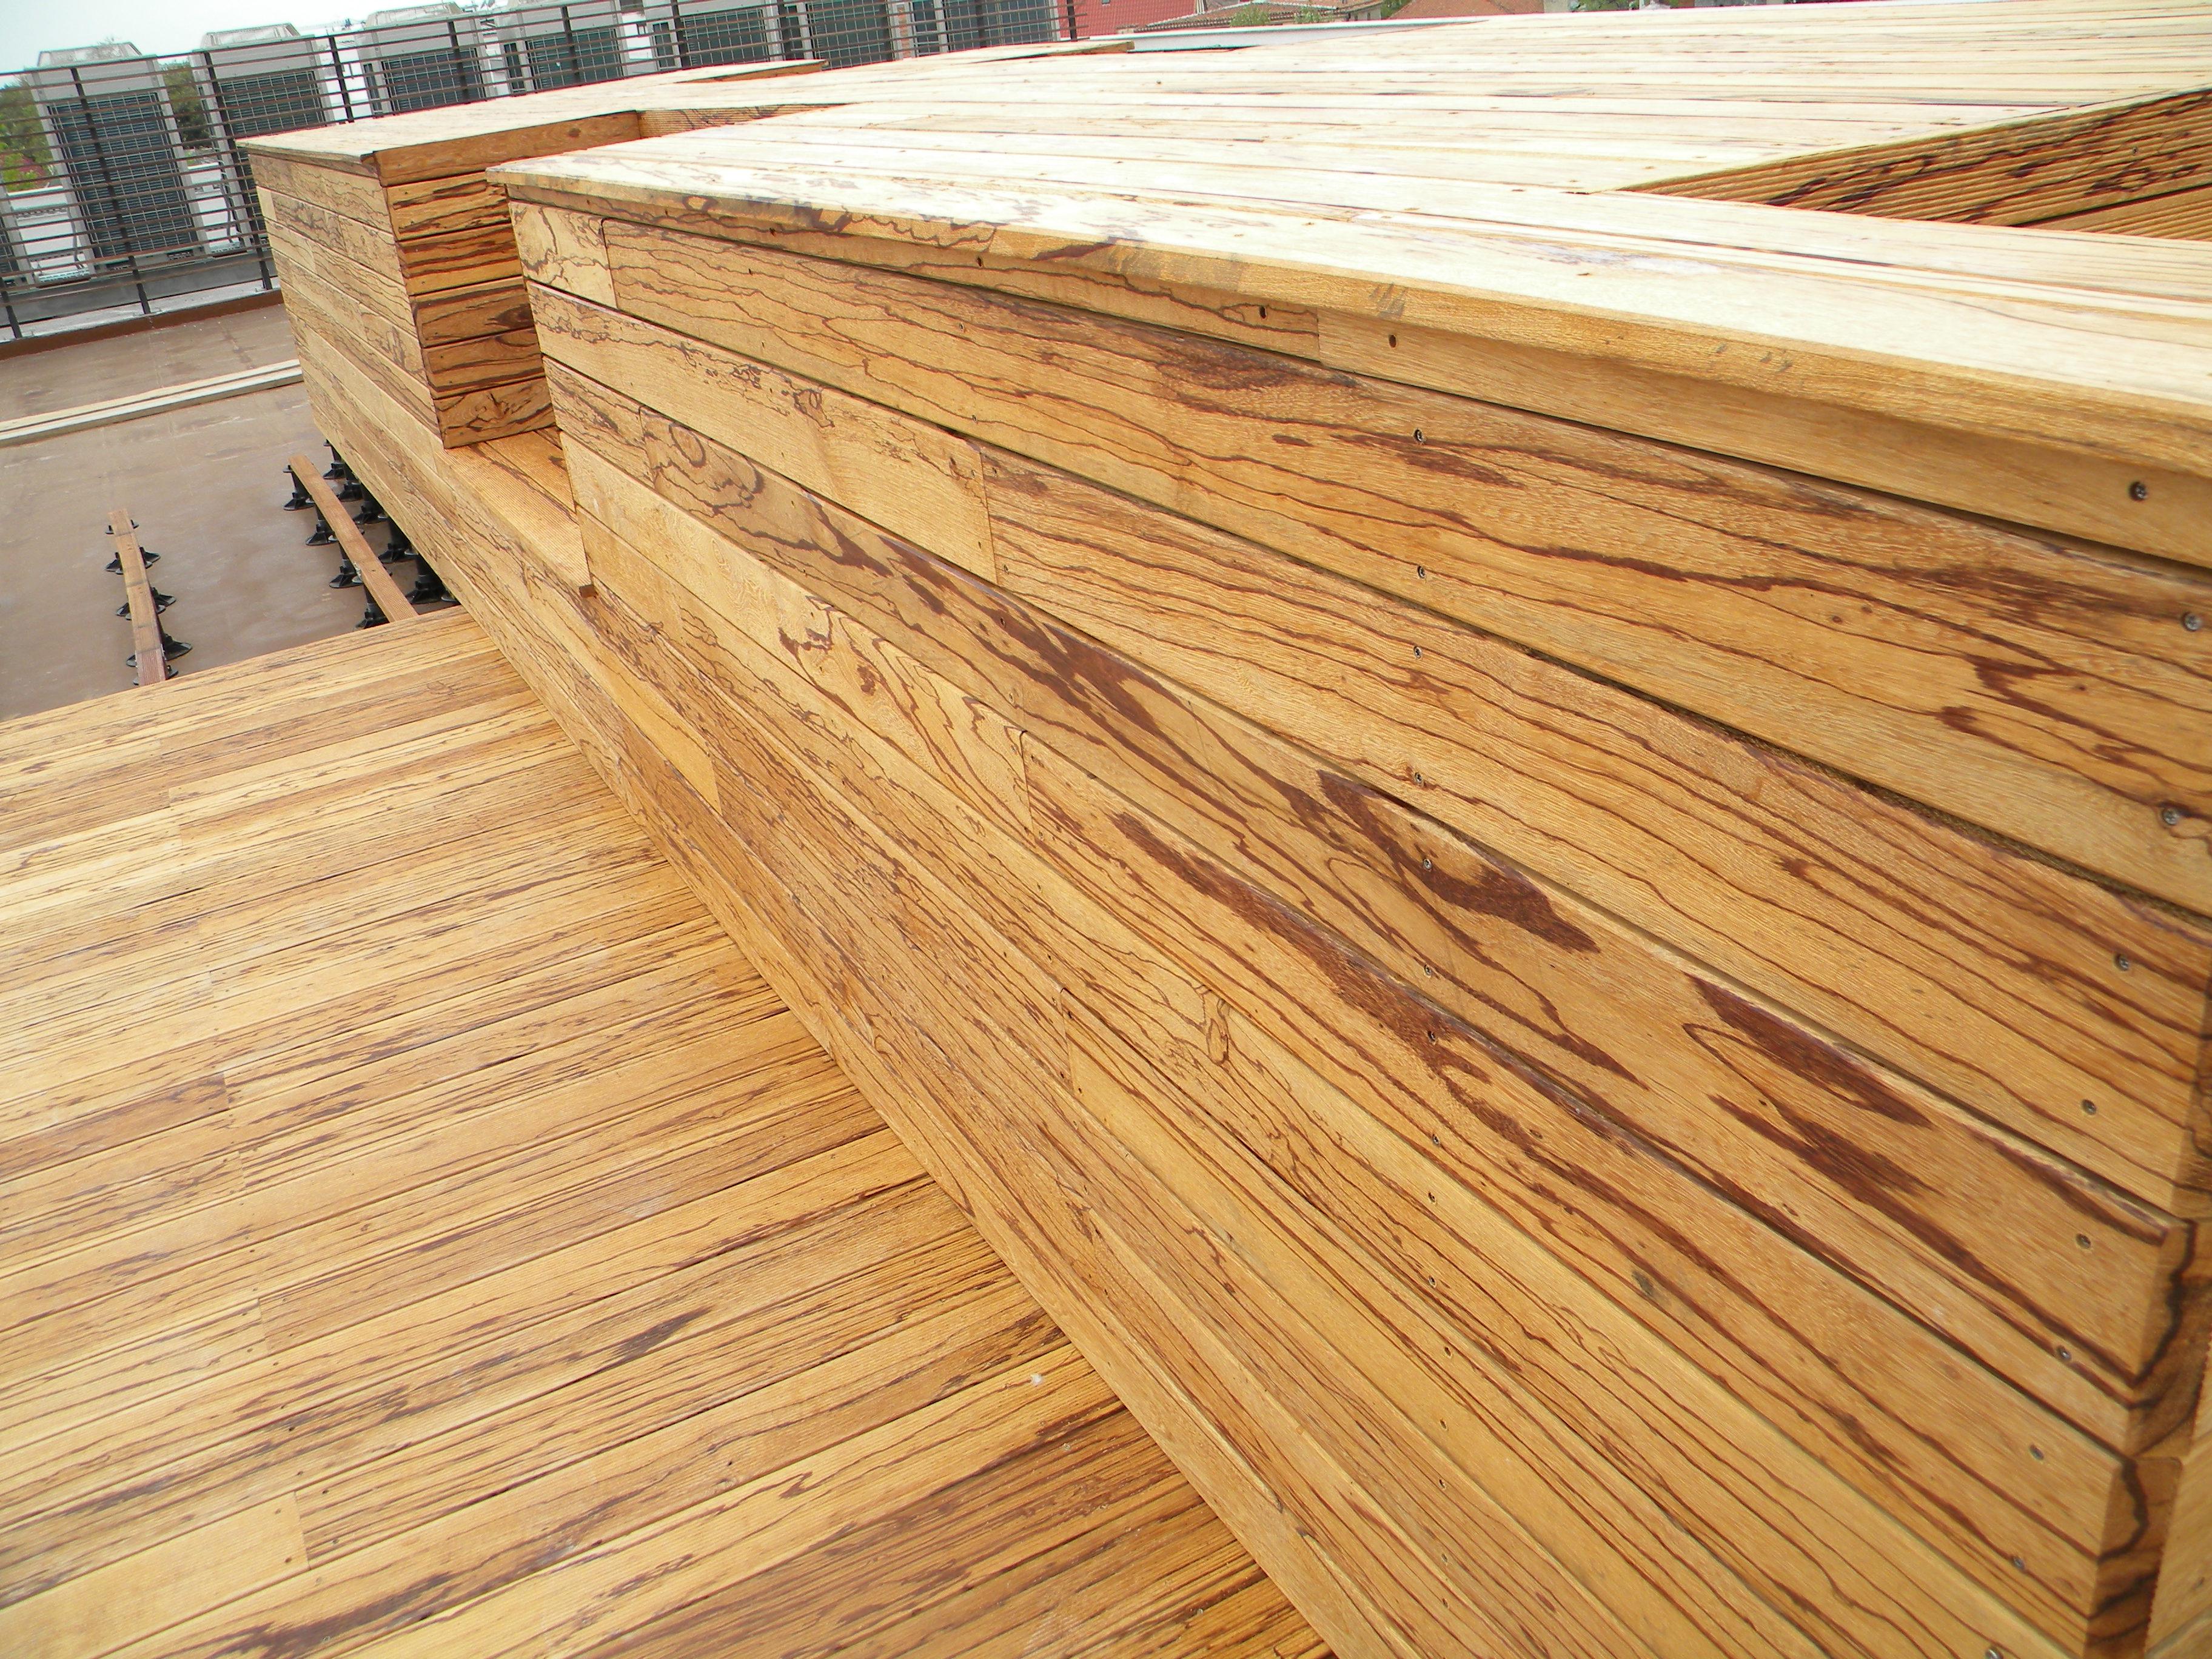 Deck-uri lemn - Angelim Rajado SELVA FLOORS - Poza 37